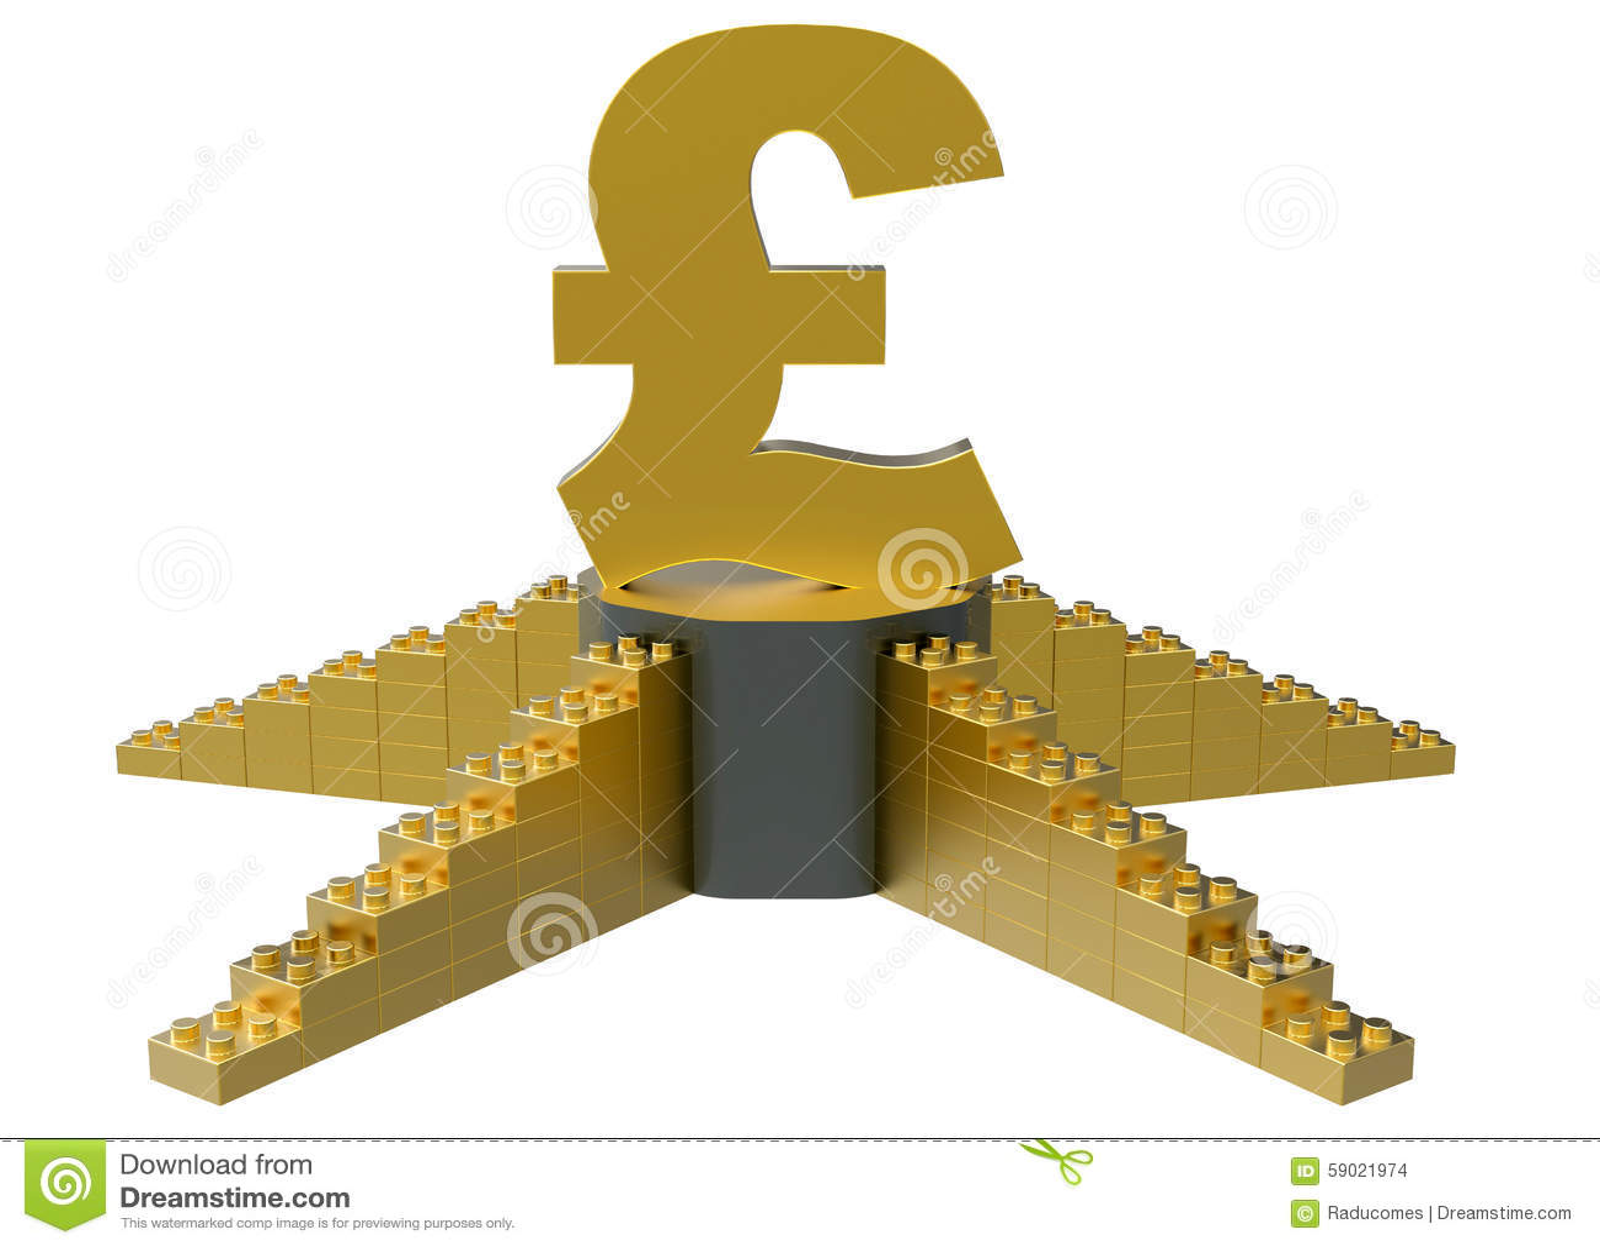 Golden Pound Symbol On A Podium Stock Illustration Illustration Of